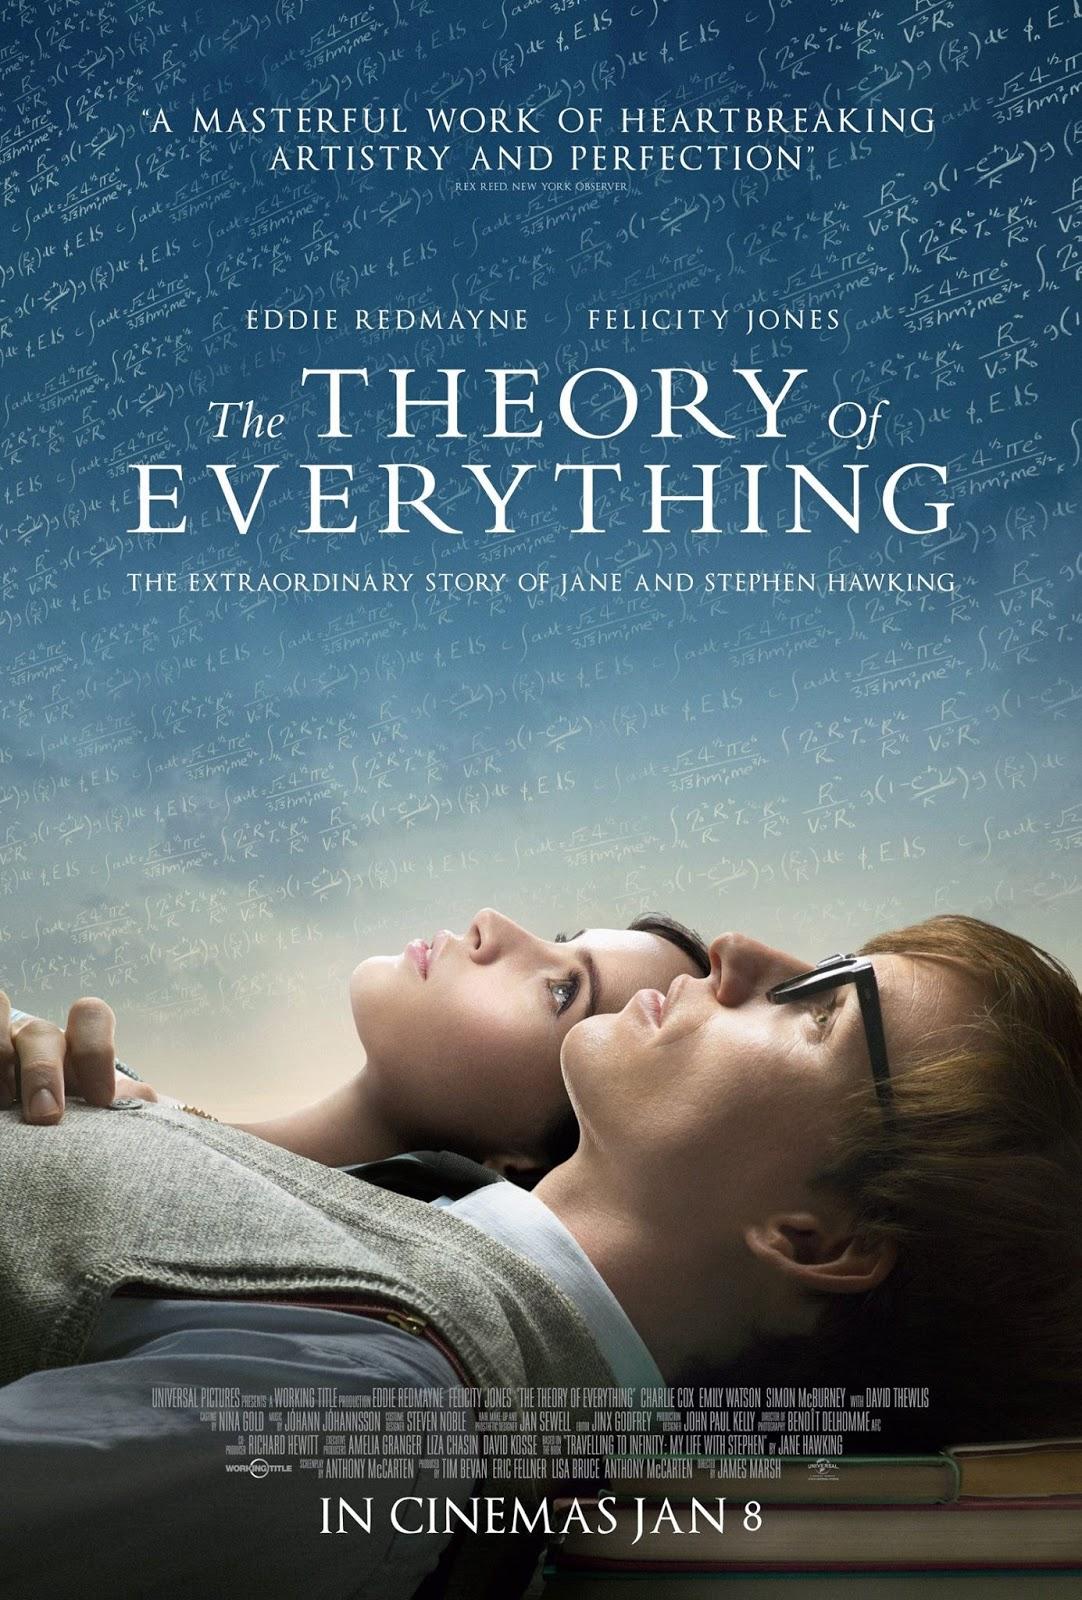 The Theory of Everything ทฤษฎีรักนิรันดร [HD][พากย์ไทย]